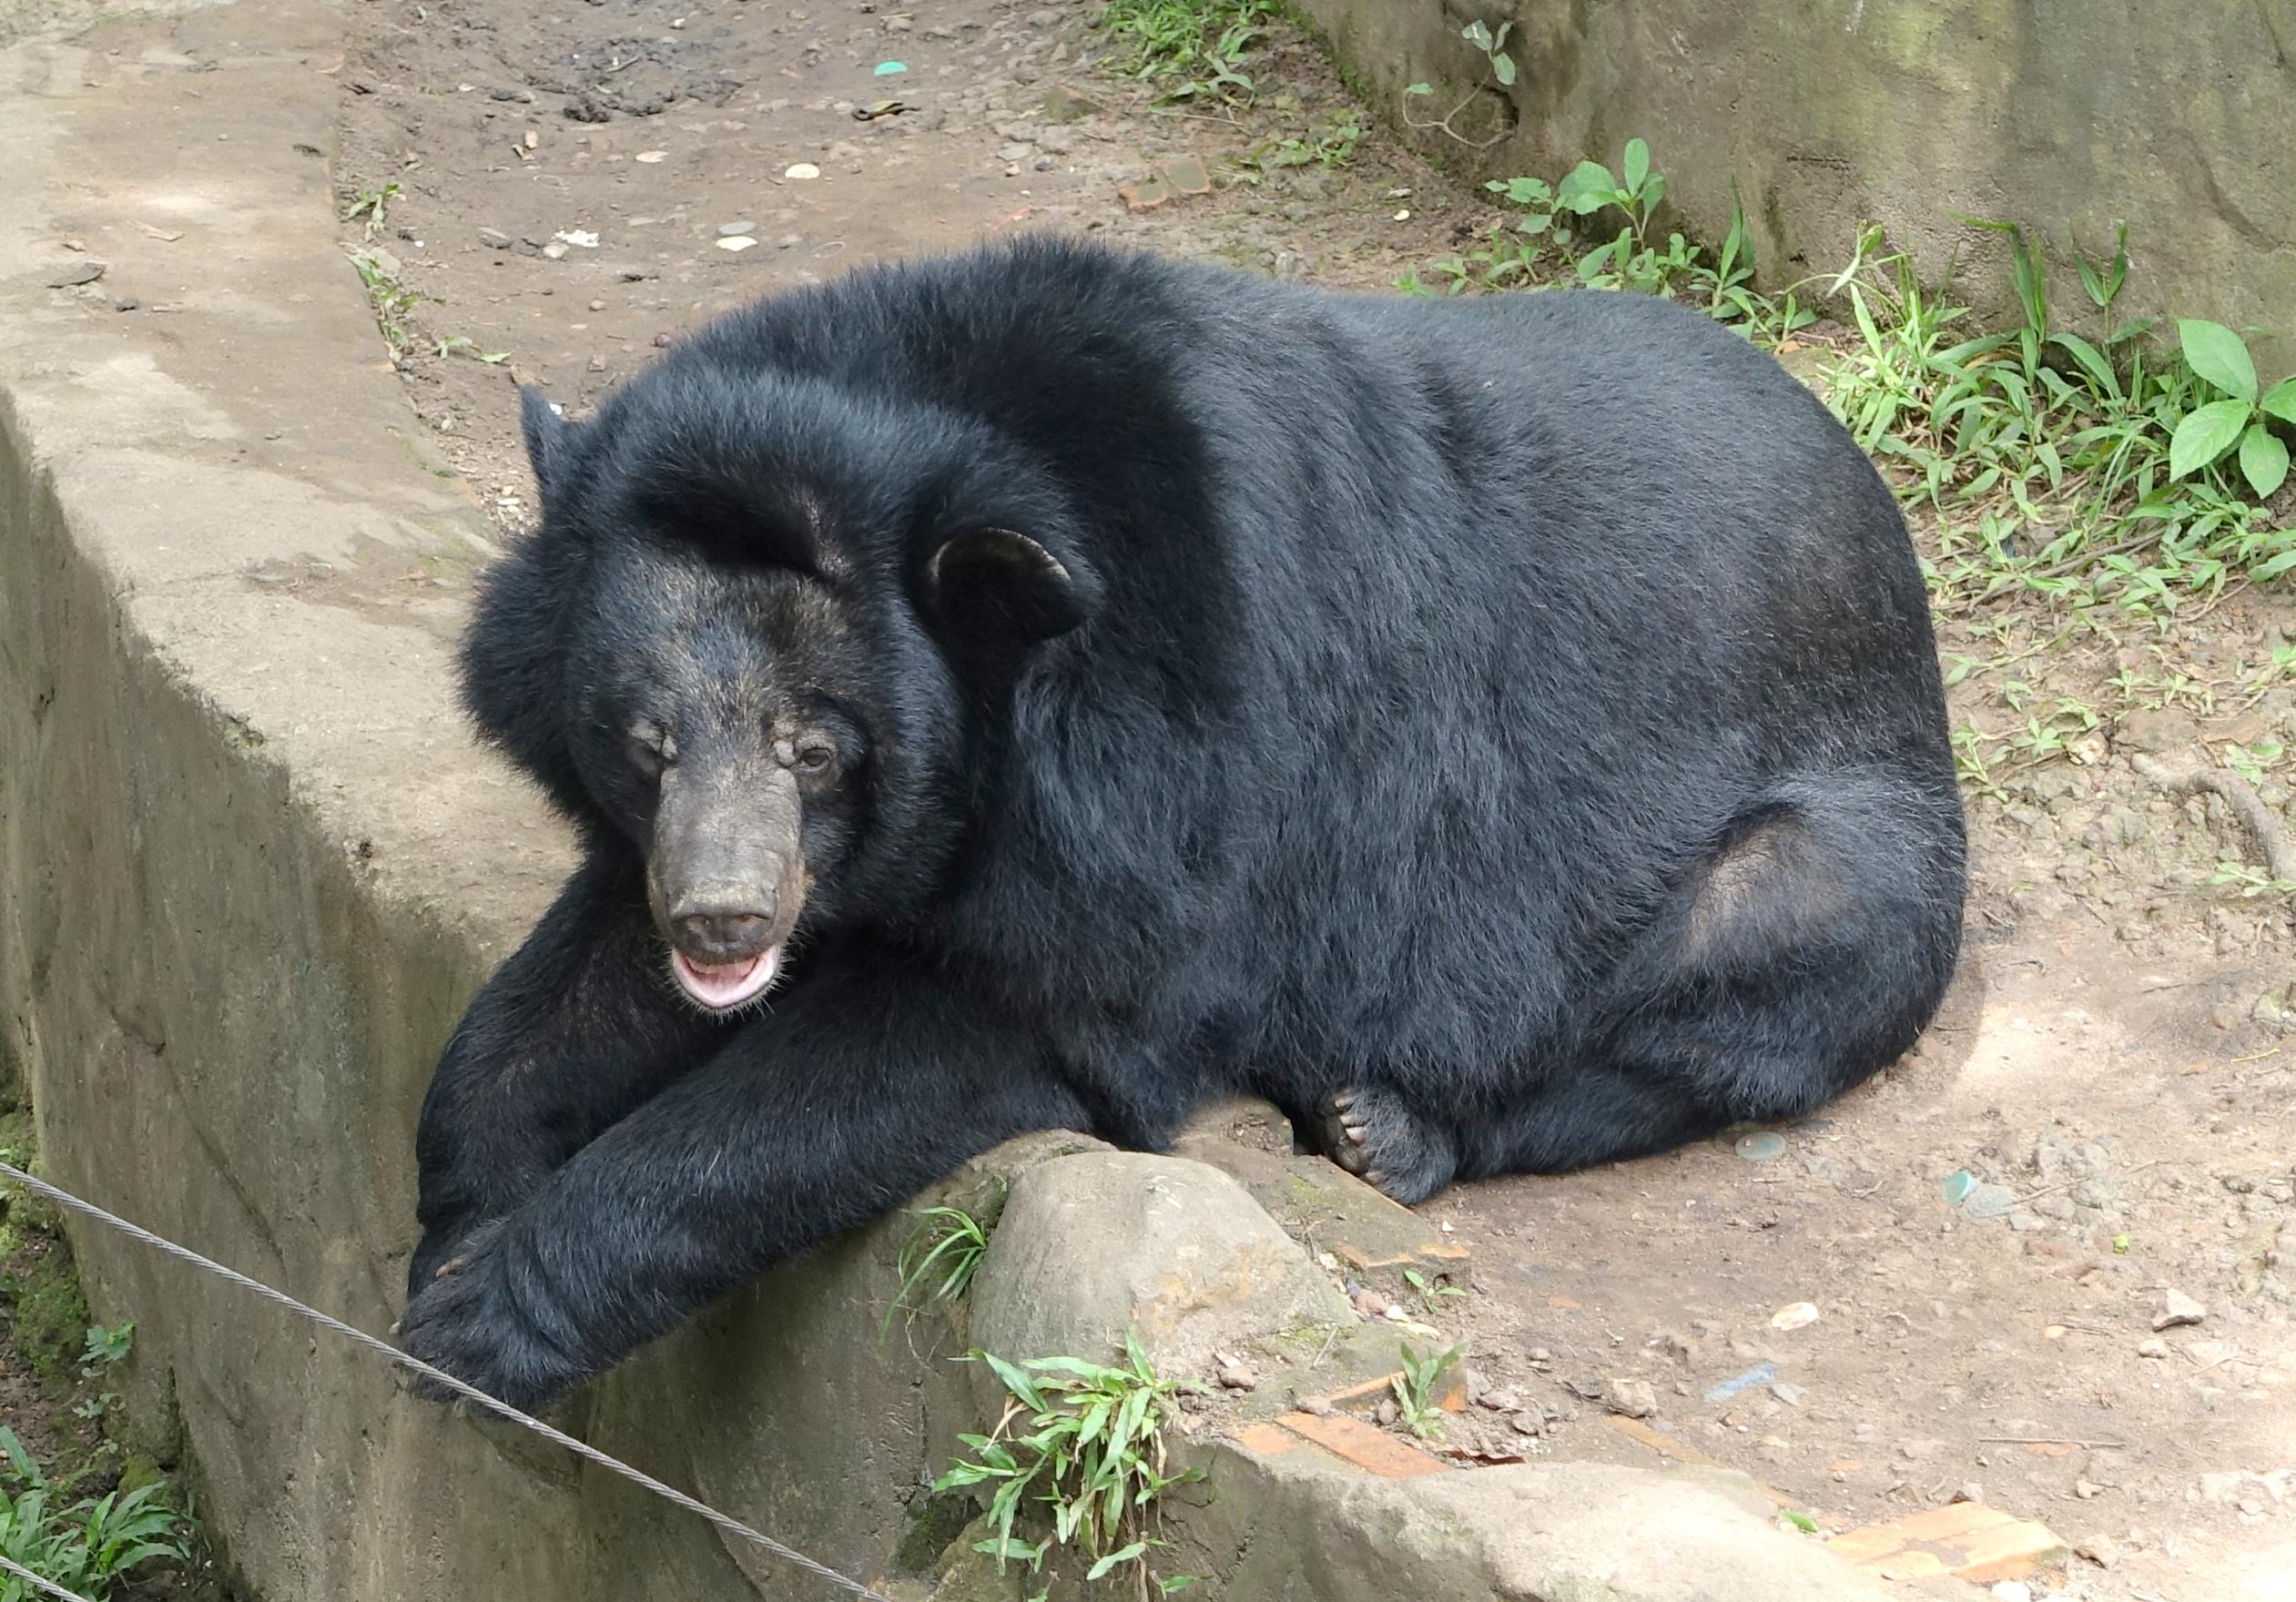 File:Bear (unknown) - Saigon Zoo and Botanical Gardens - Ho Chi Minh City, Vietnam - DSC01187.JPG - Wikimedia Commons